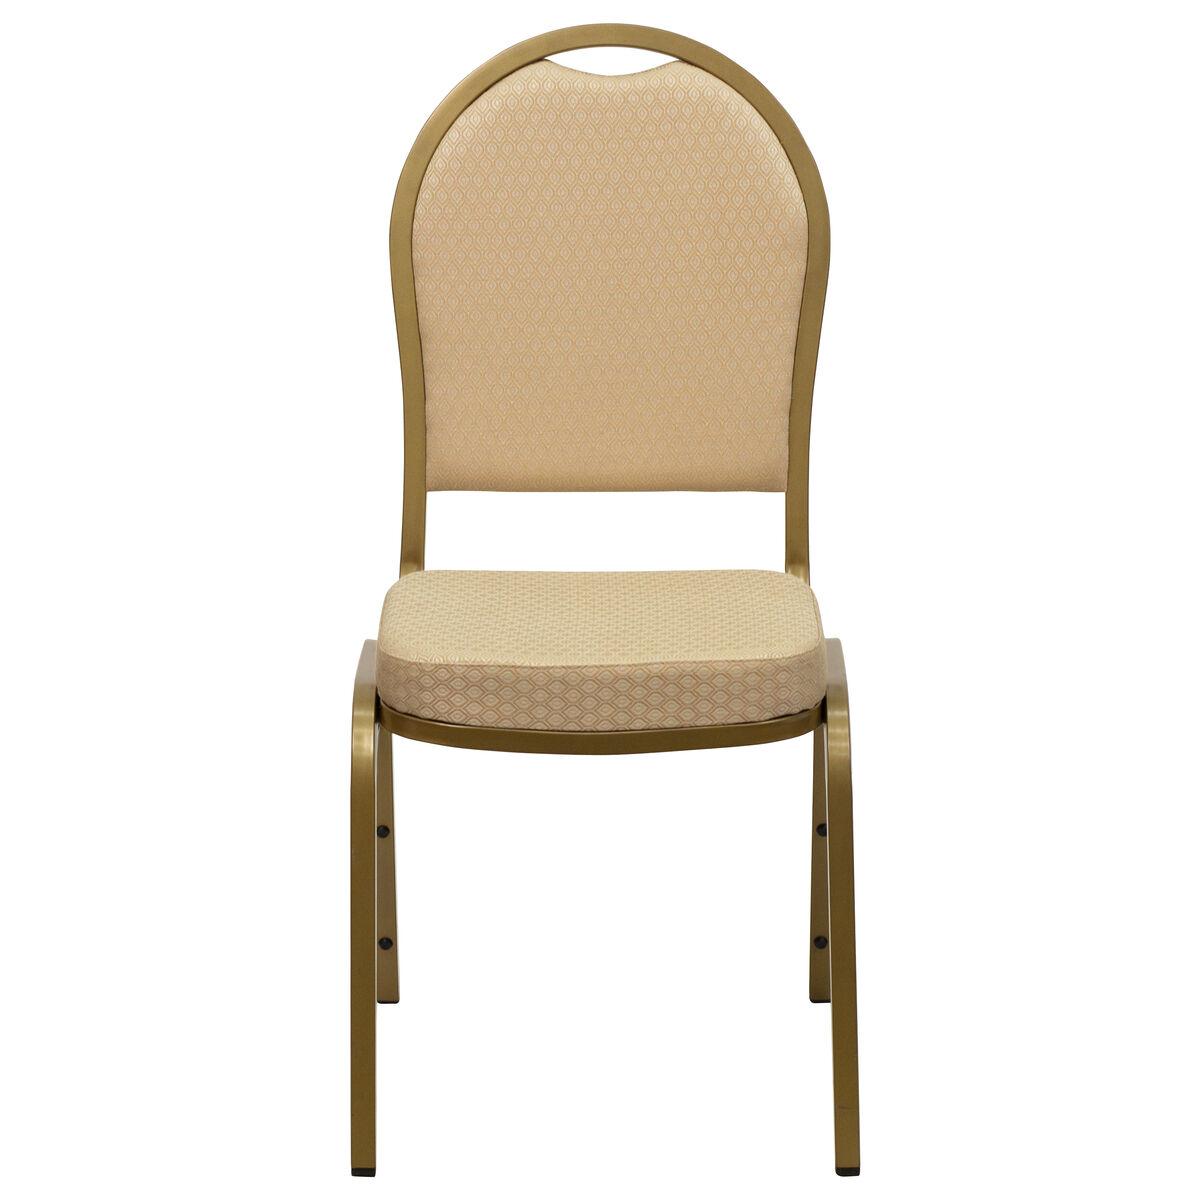 Flash furniture fd c03 allgold h20124e gg for H furniture ww chair